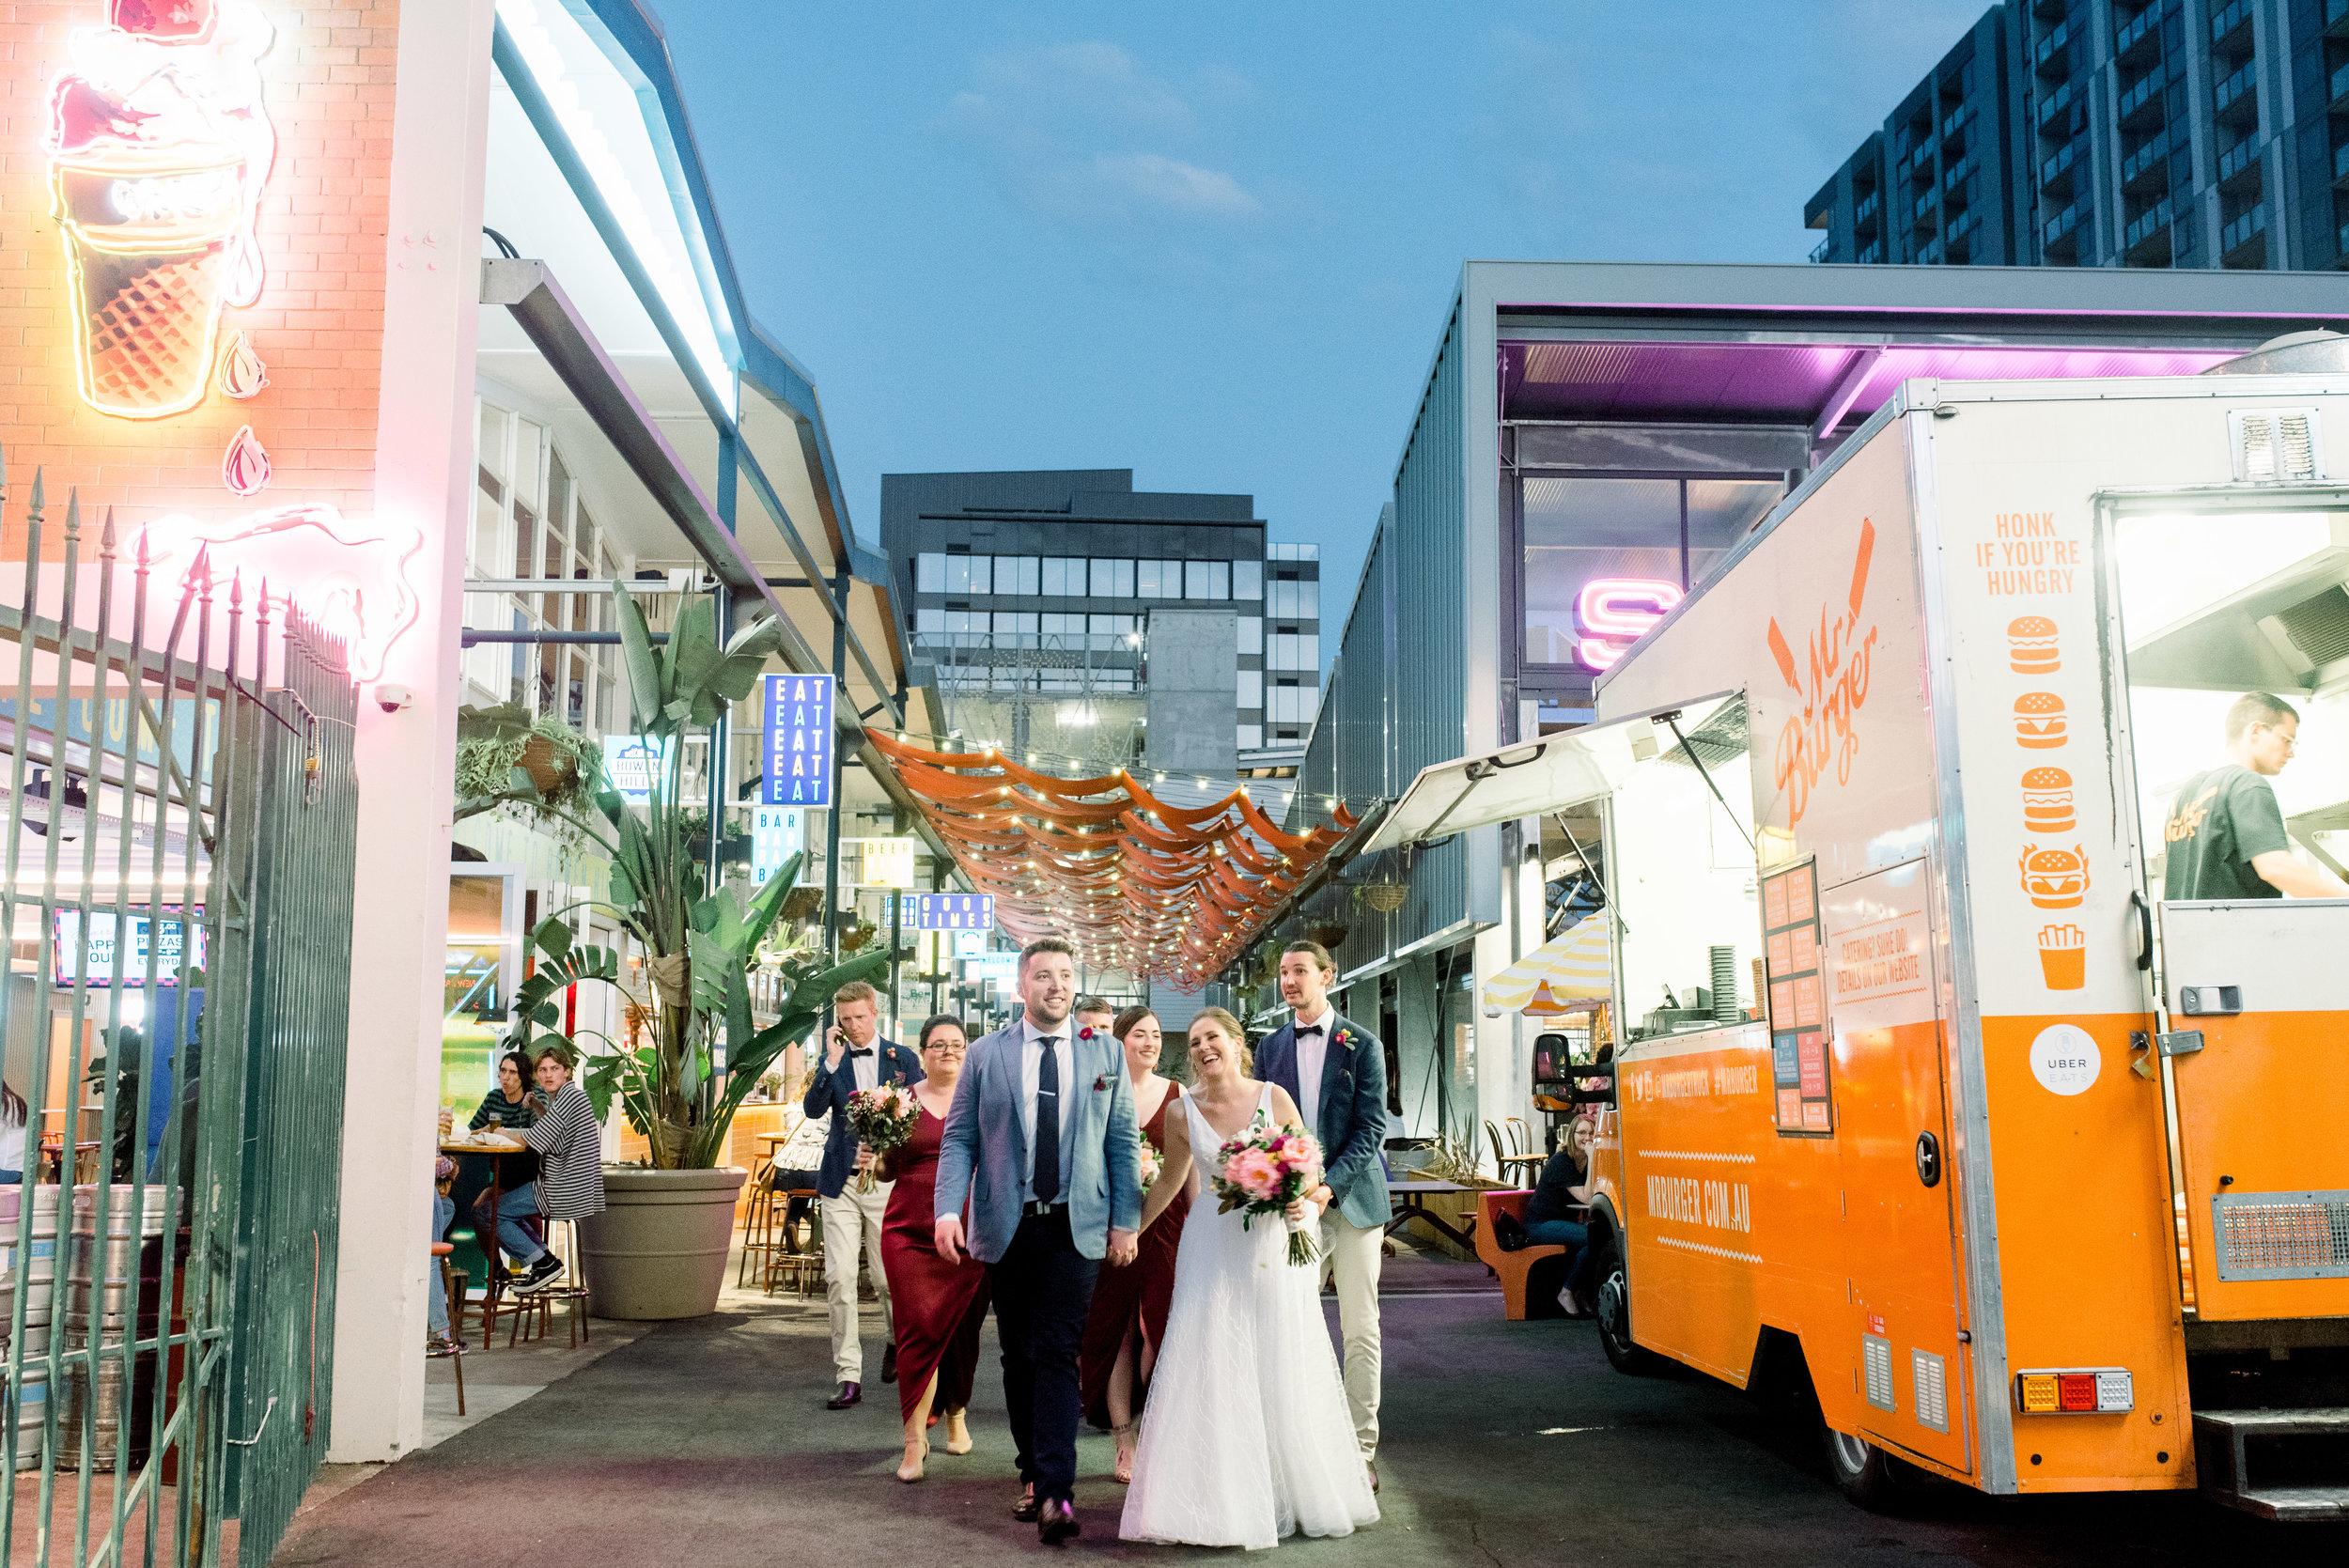 refinery-wedding-brisbane-city-wedding-photographer-81.jpg